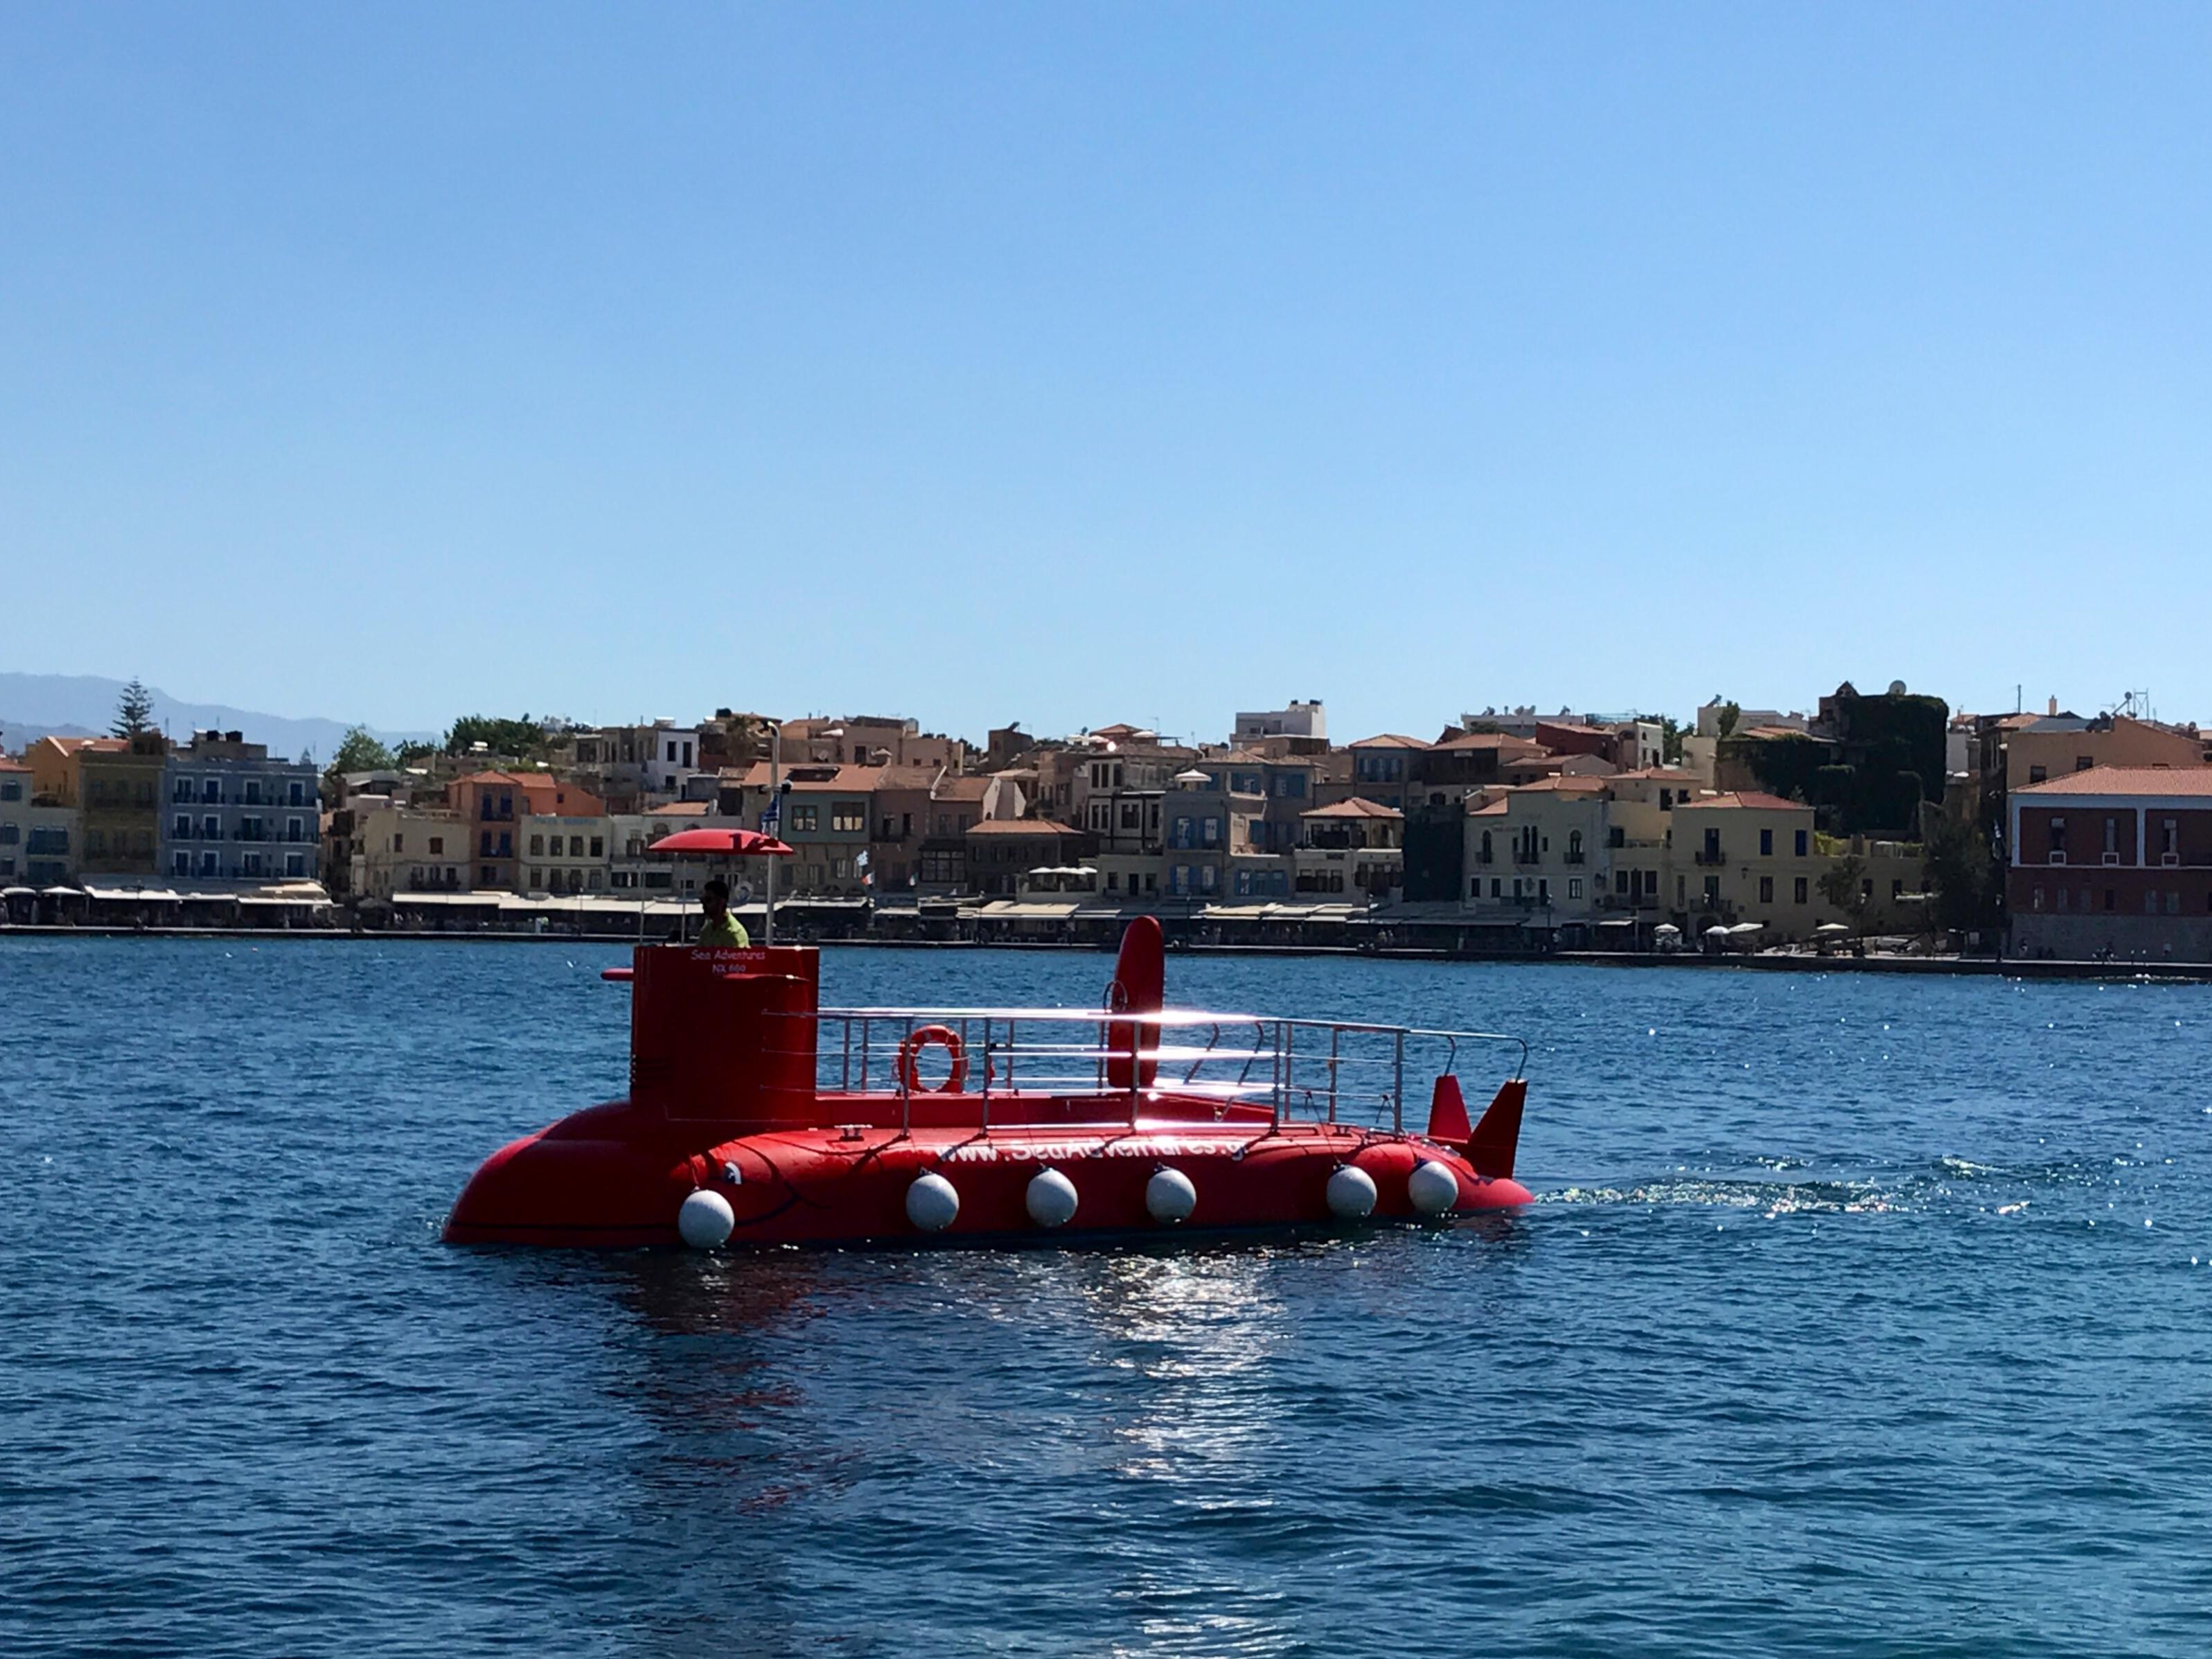 Et rødt ubåt-liknende fartøy i vannet.